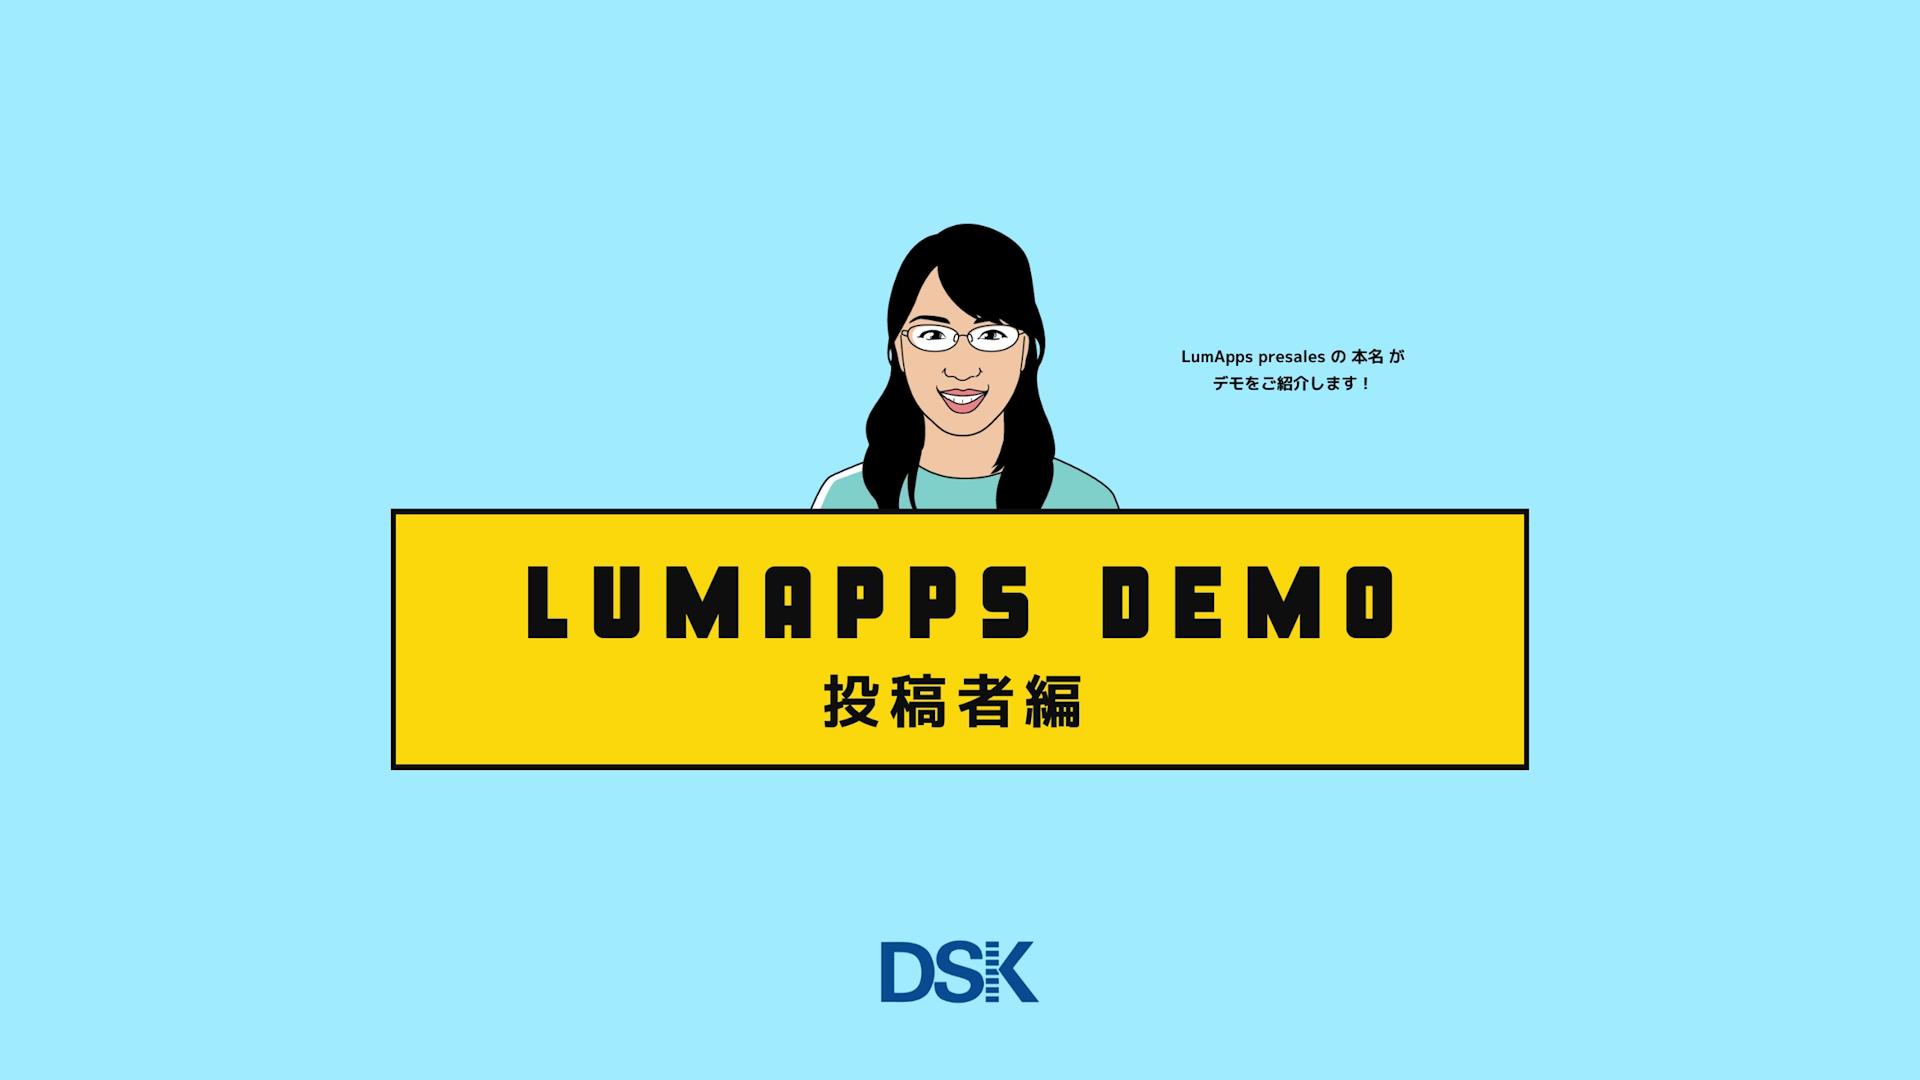 lumapps-demo-contributor